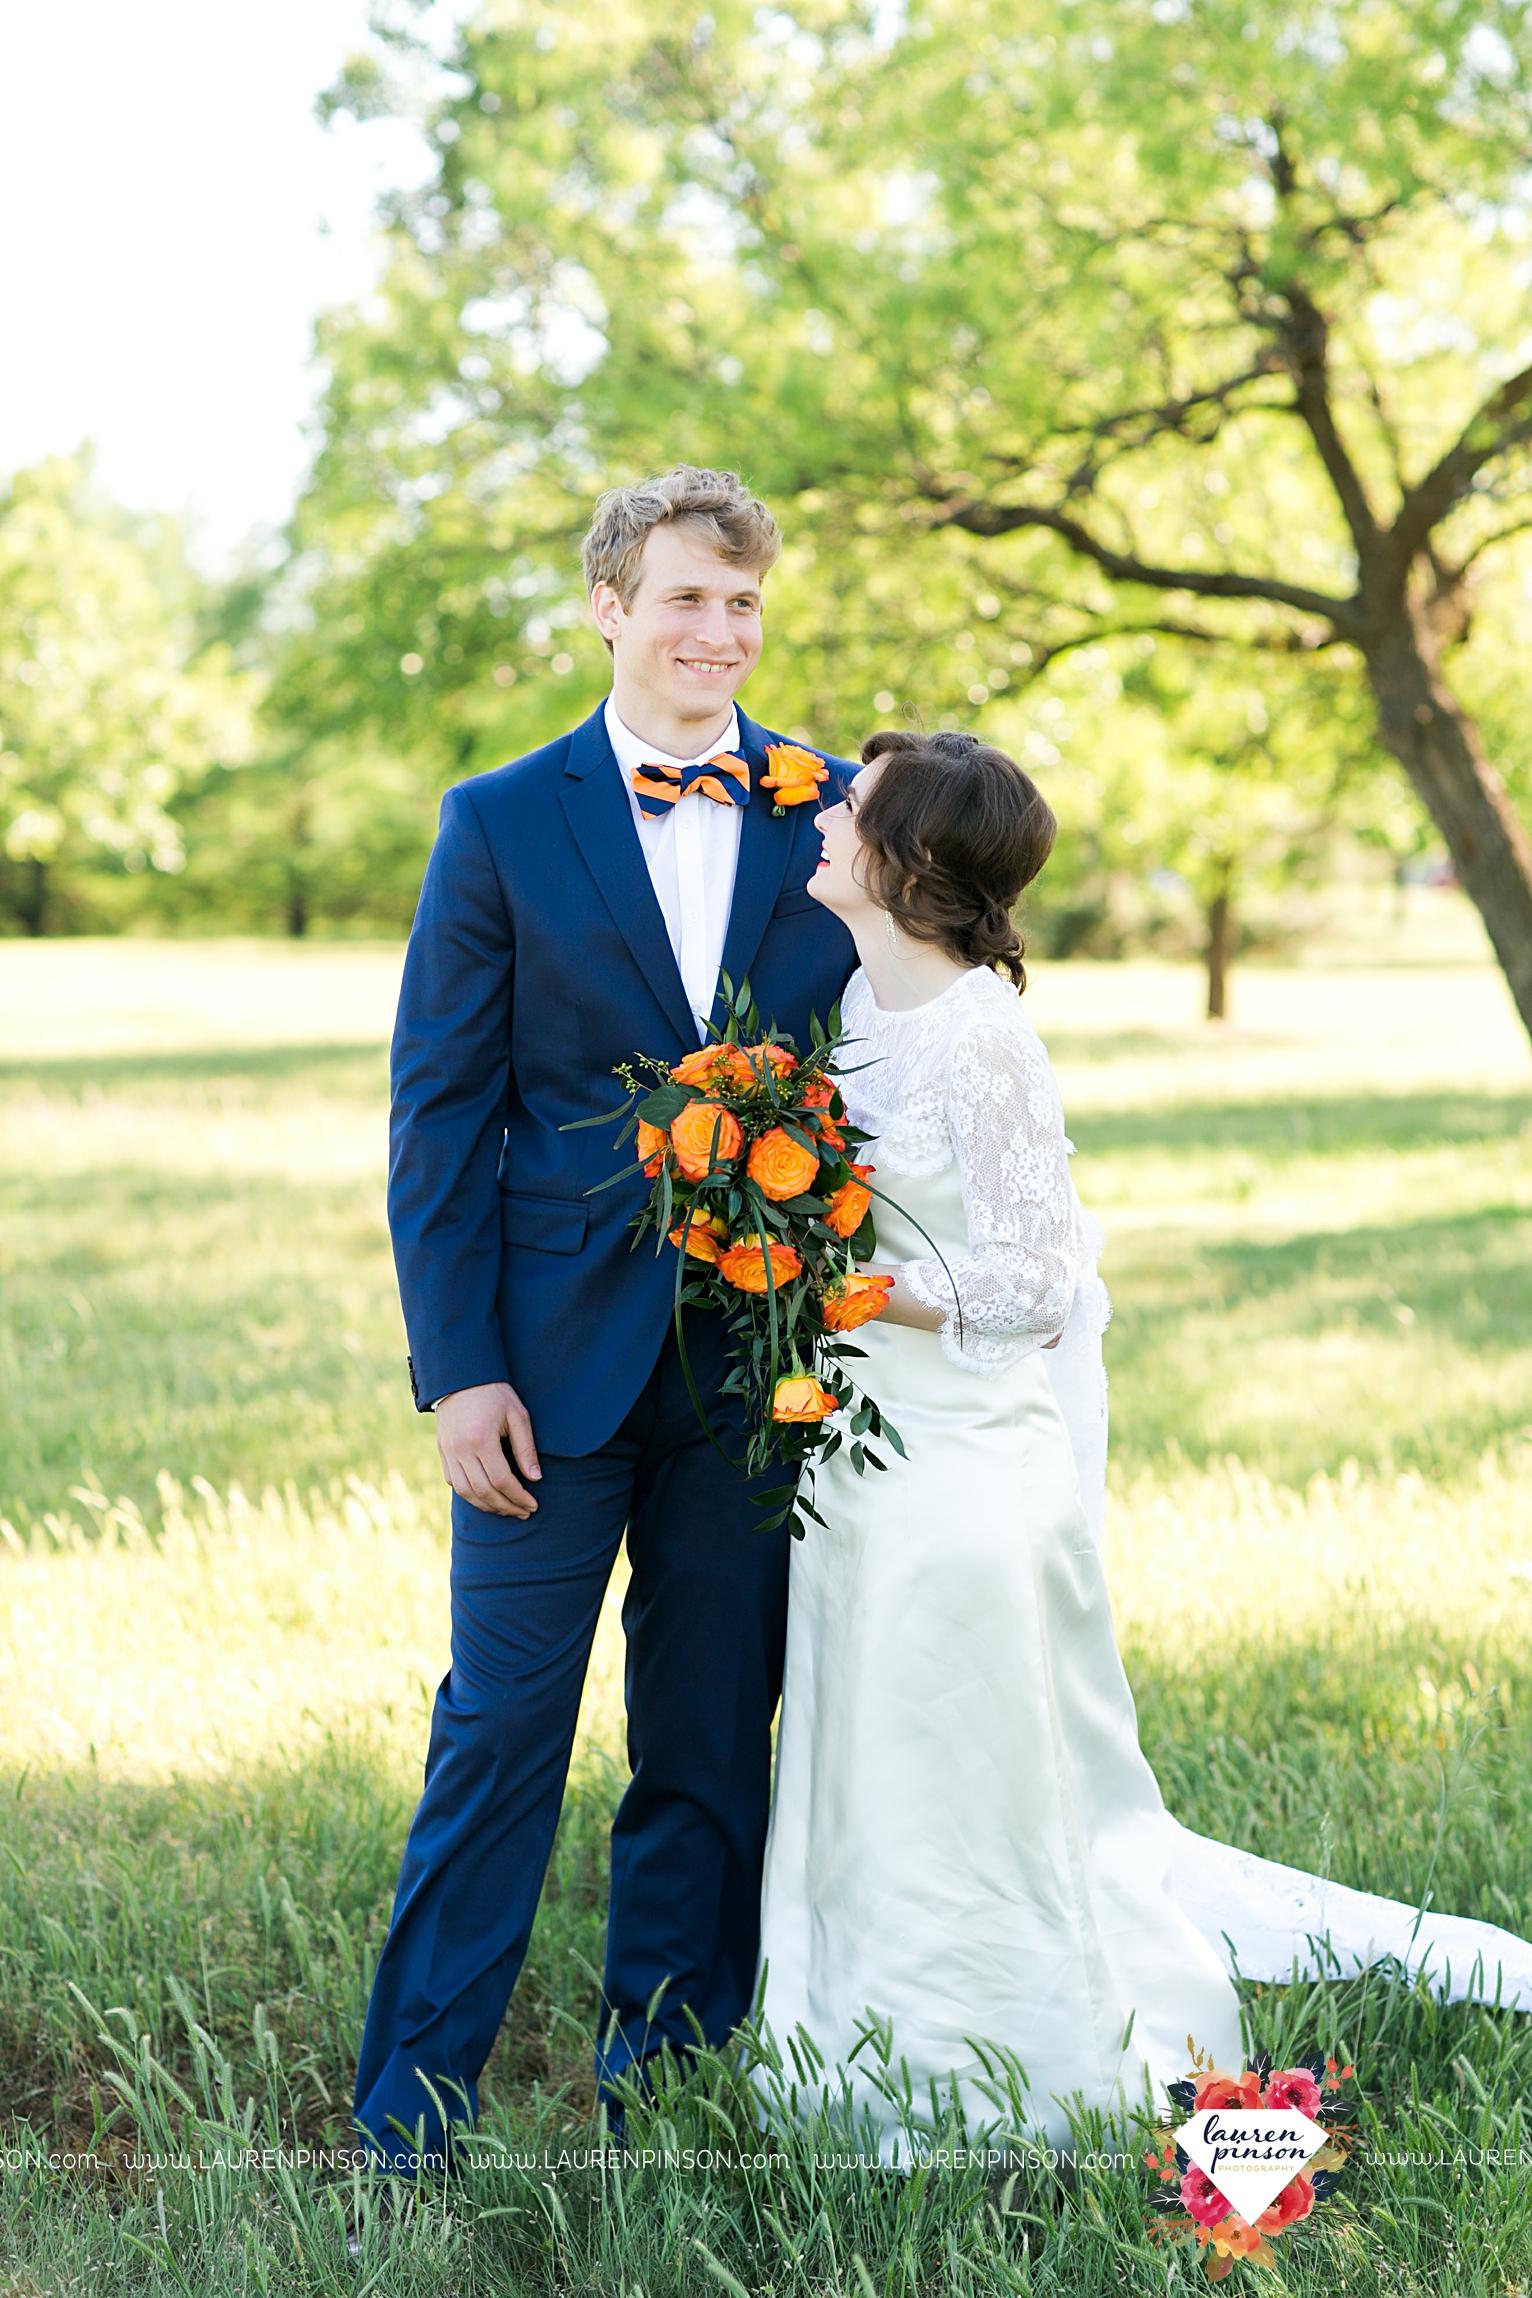 wichita-falls-texas-wedding-photographer-vintage-off-beat-bride-faith-village-church-of-christ-the-plex-roller-skating_2429.jpg